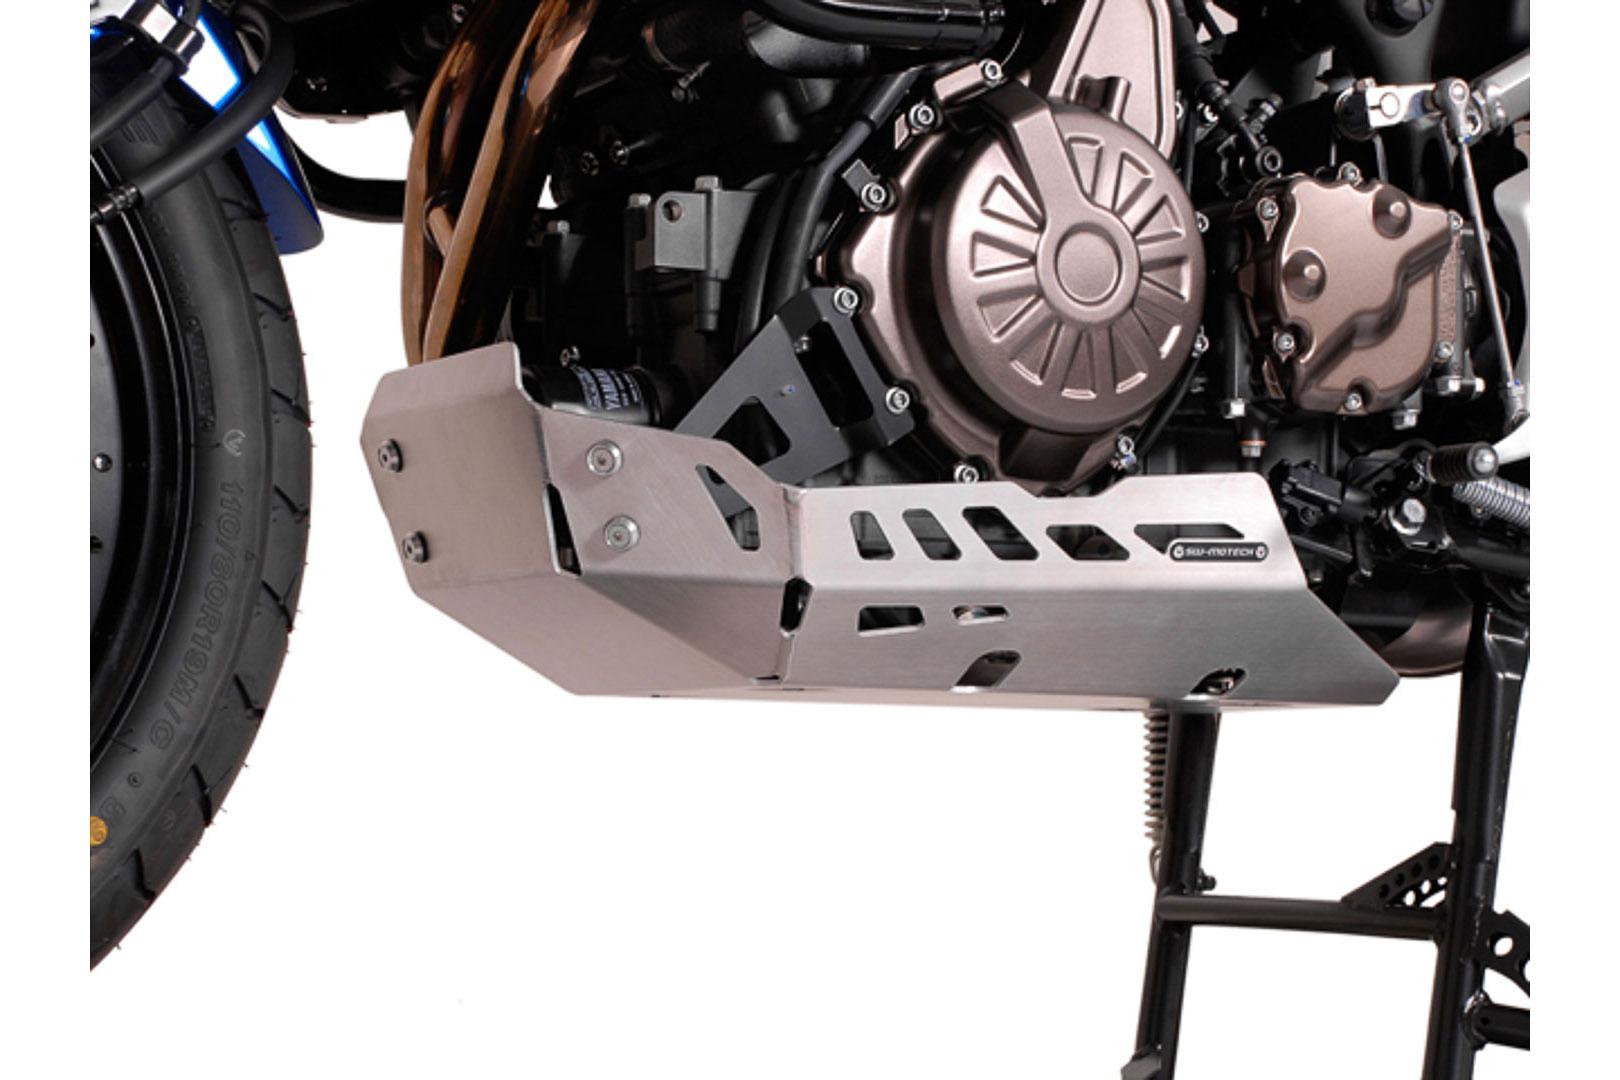 SW-Motech Pohjapanssari Yamaha XT1200Z Super Tenere, hopea